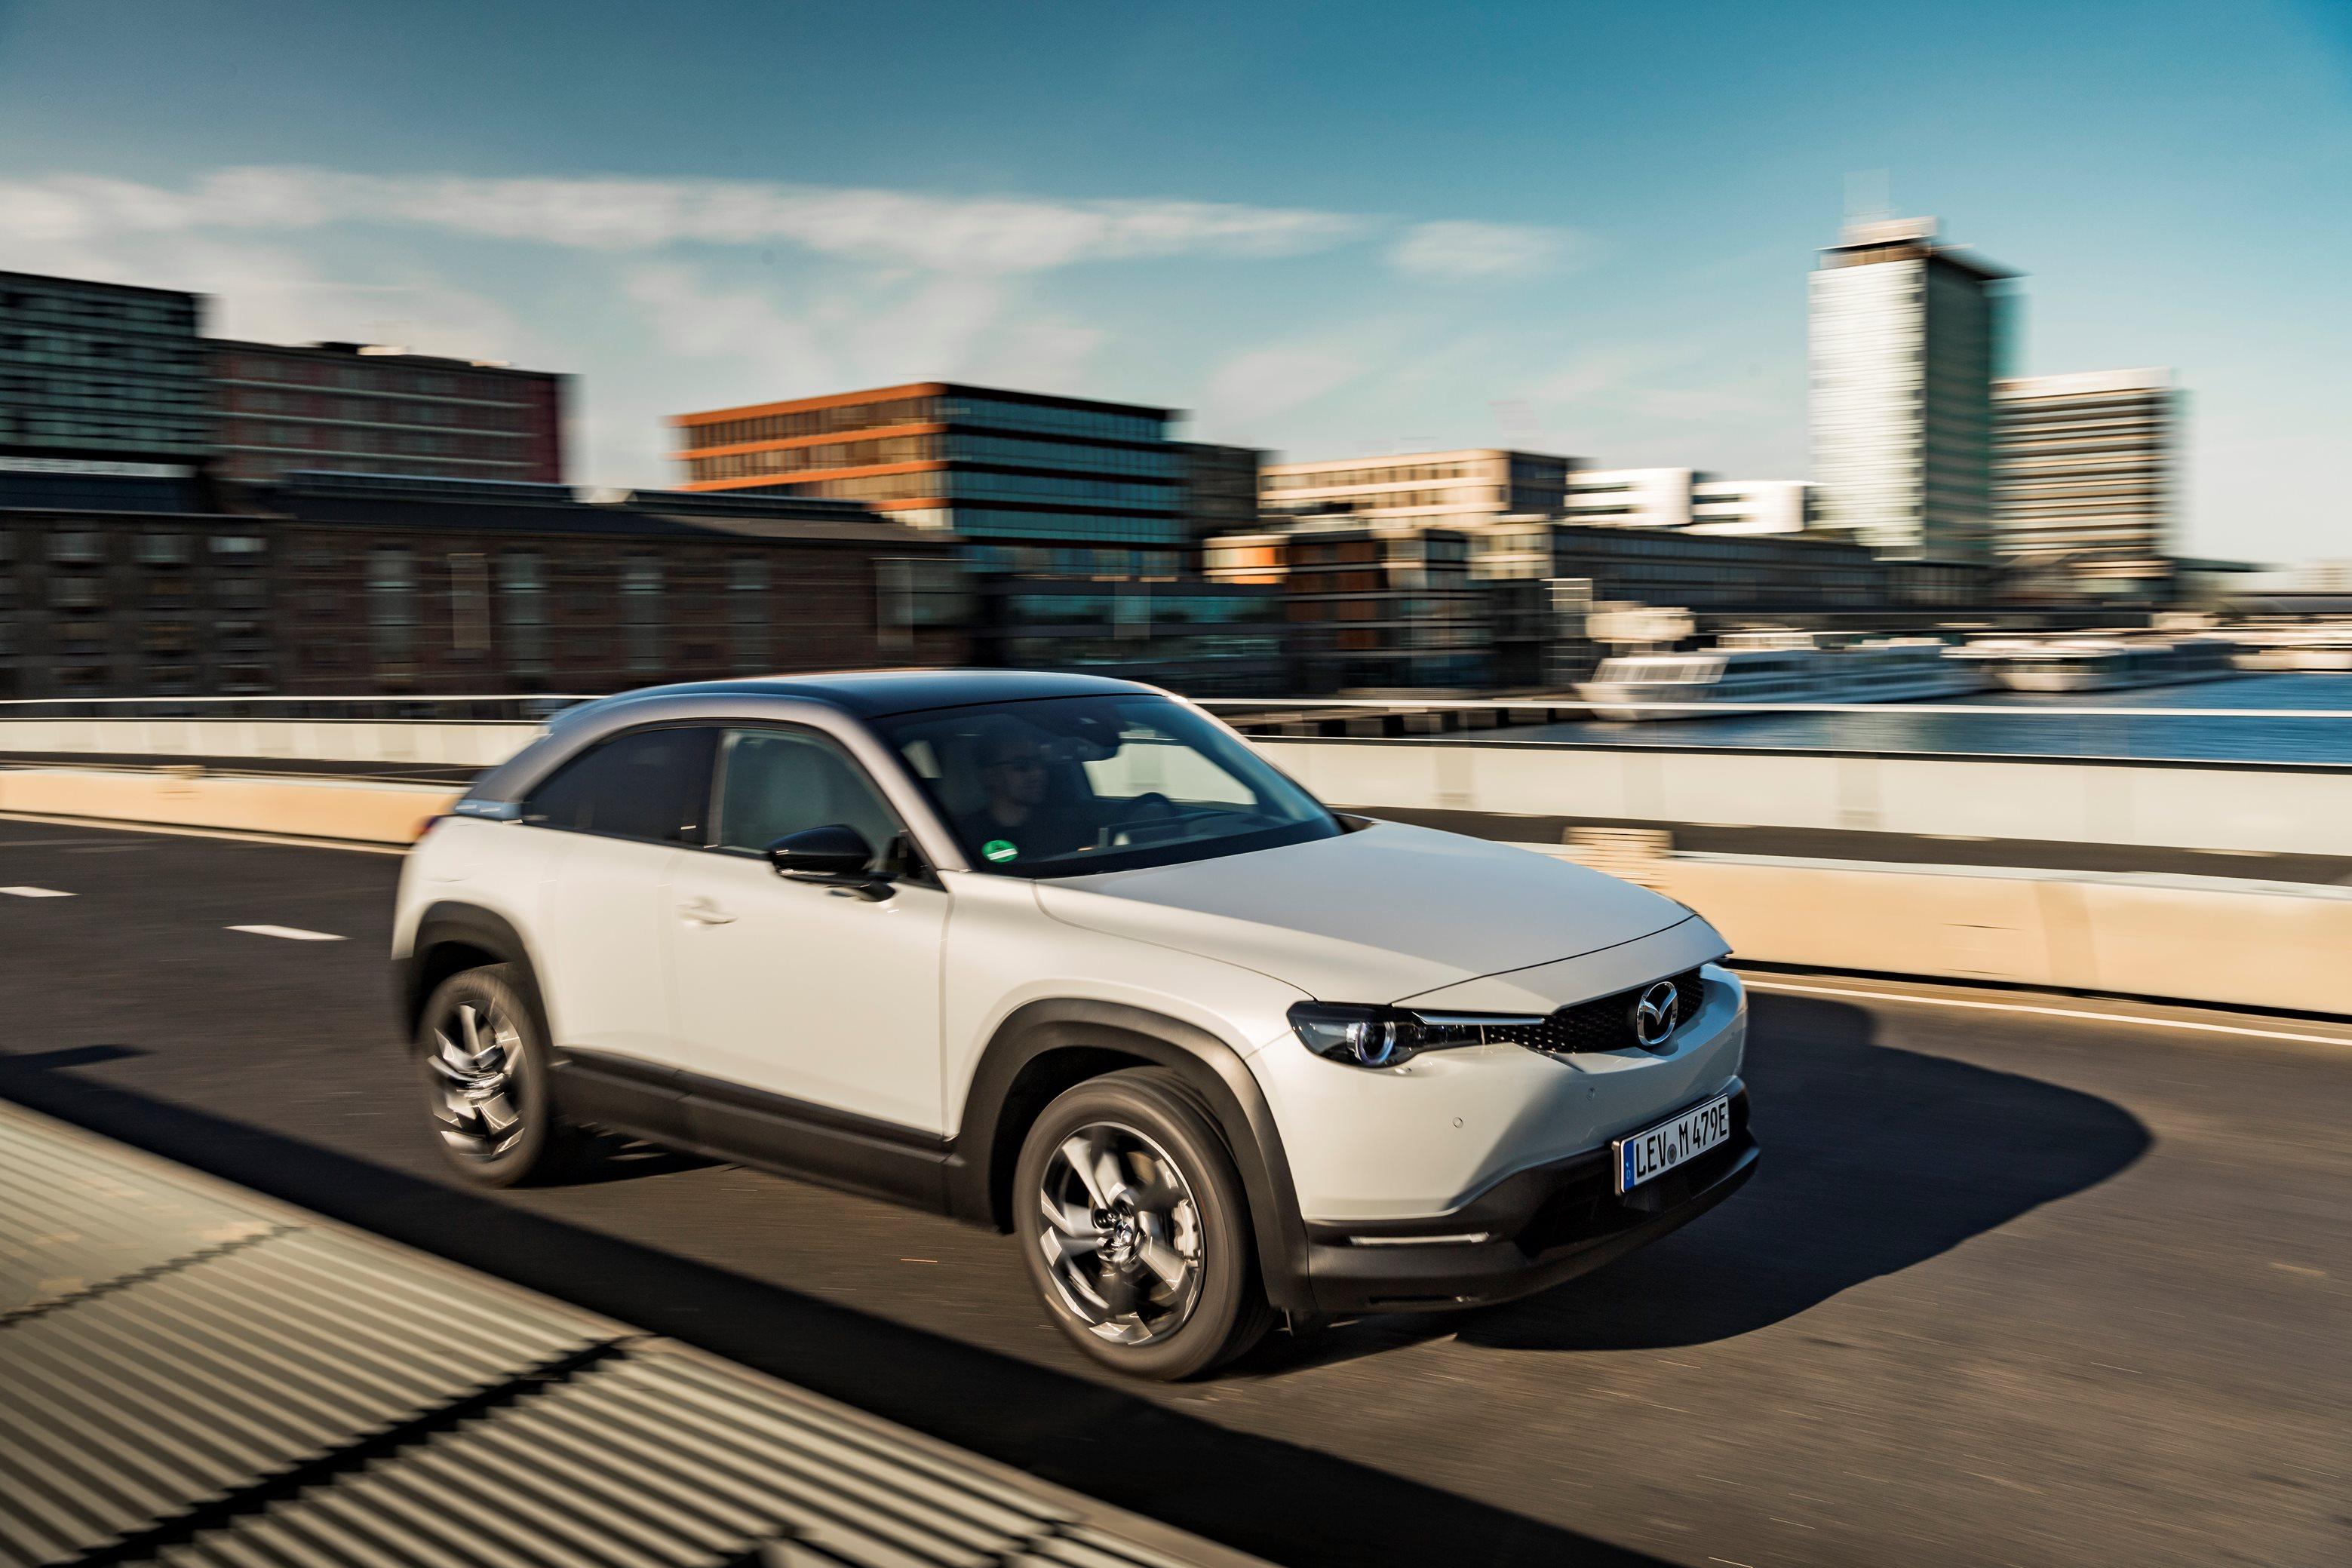 https://peternel.mazda.at/wp-content/uploads/sites/96/2020/12/Action-Mazda-MX-30-Ceramic-White-2-1-1.jpg